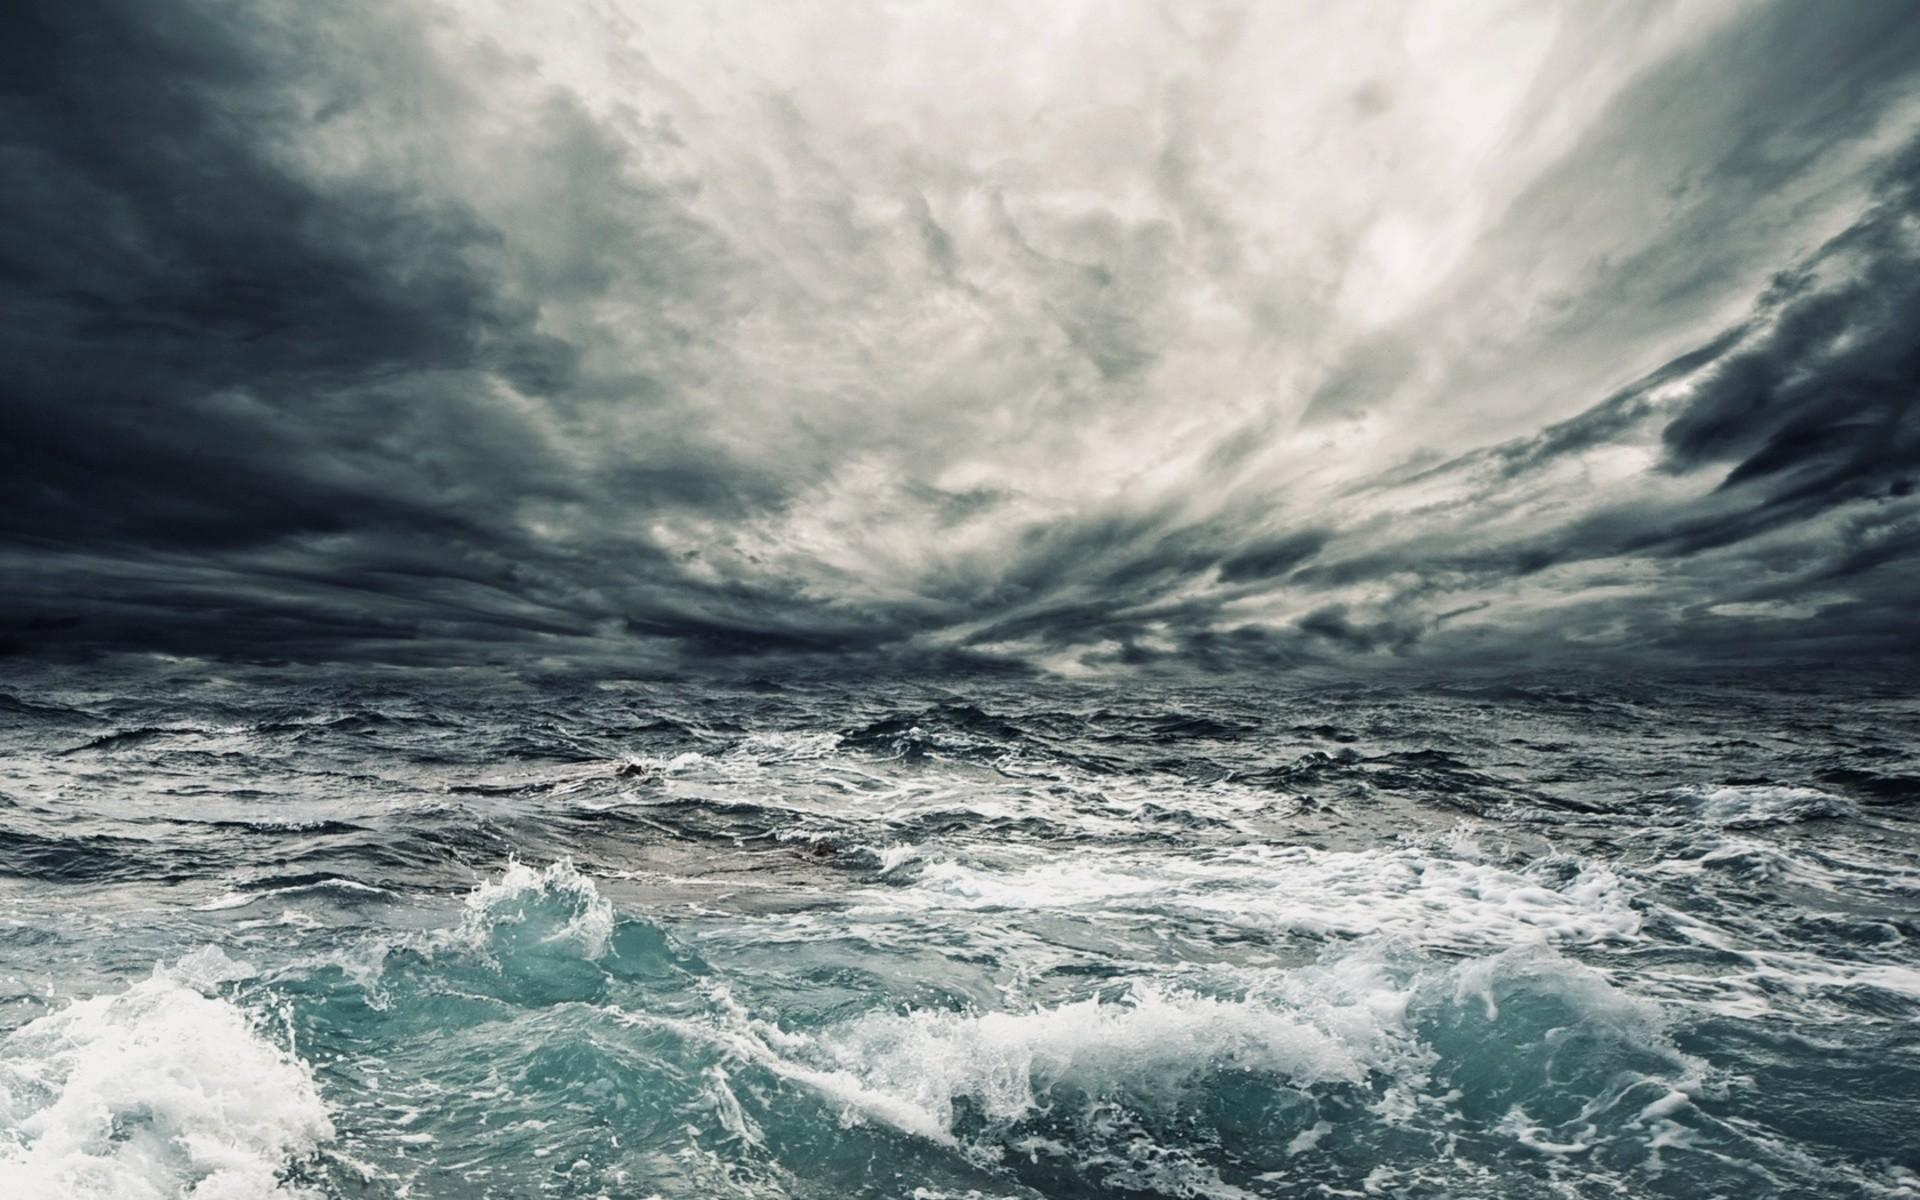 Stormy Ocean Wallpaper 1920×1080 Stormy, Ocean 0 HTML code.  https://www.fotosearch.com/photos-images/dark.